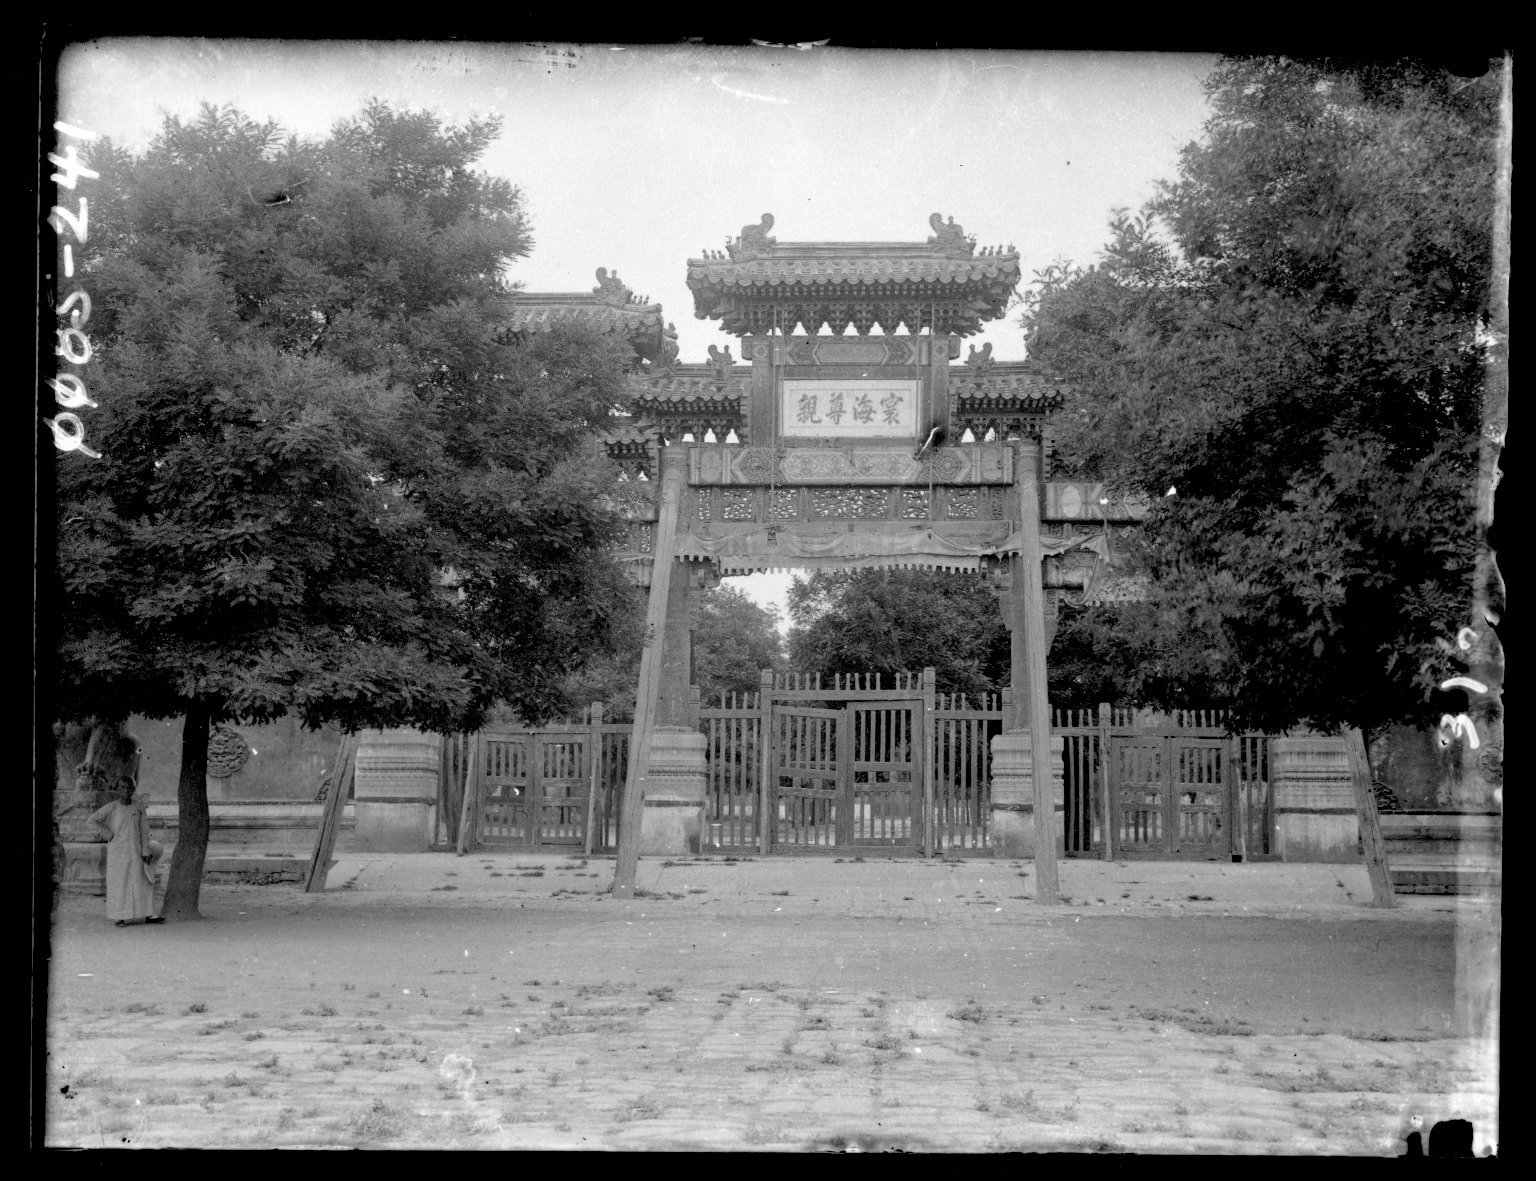 Peking (Beijing), China